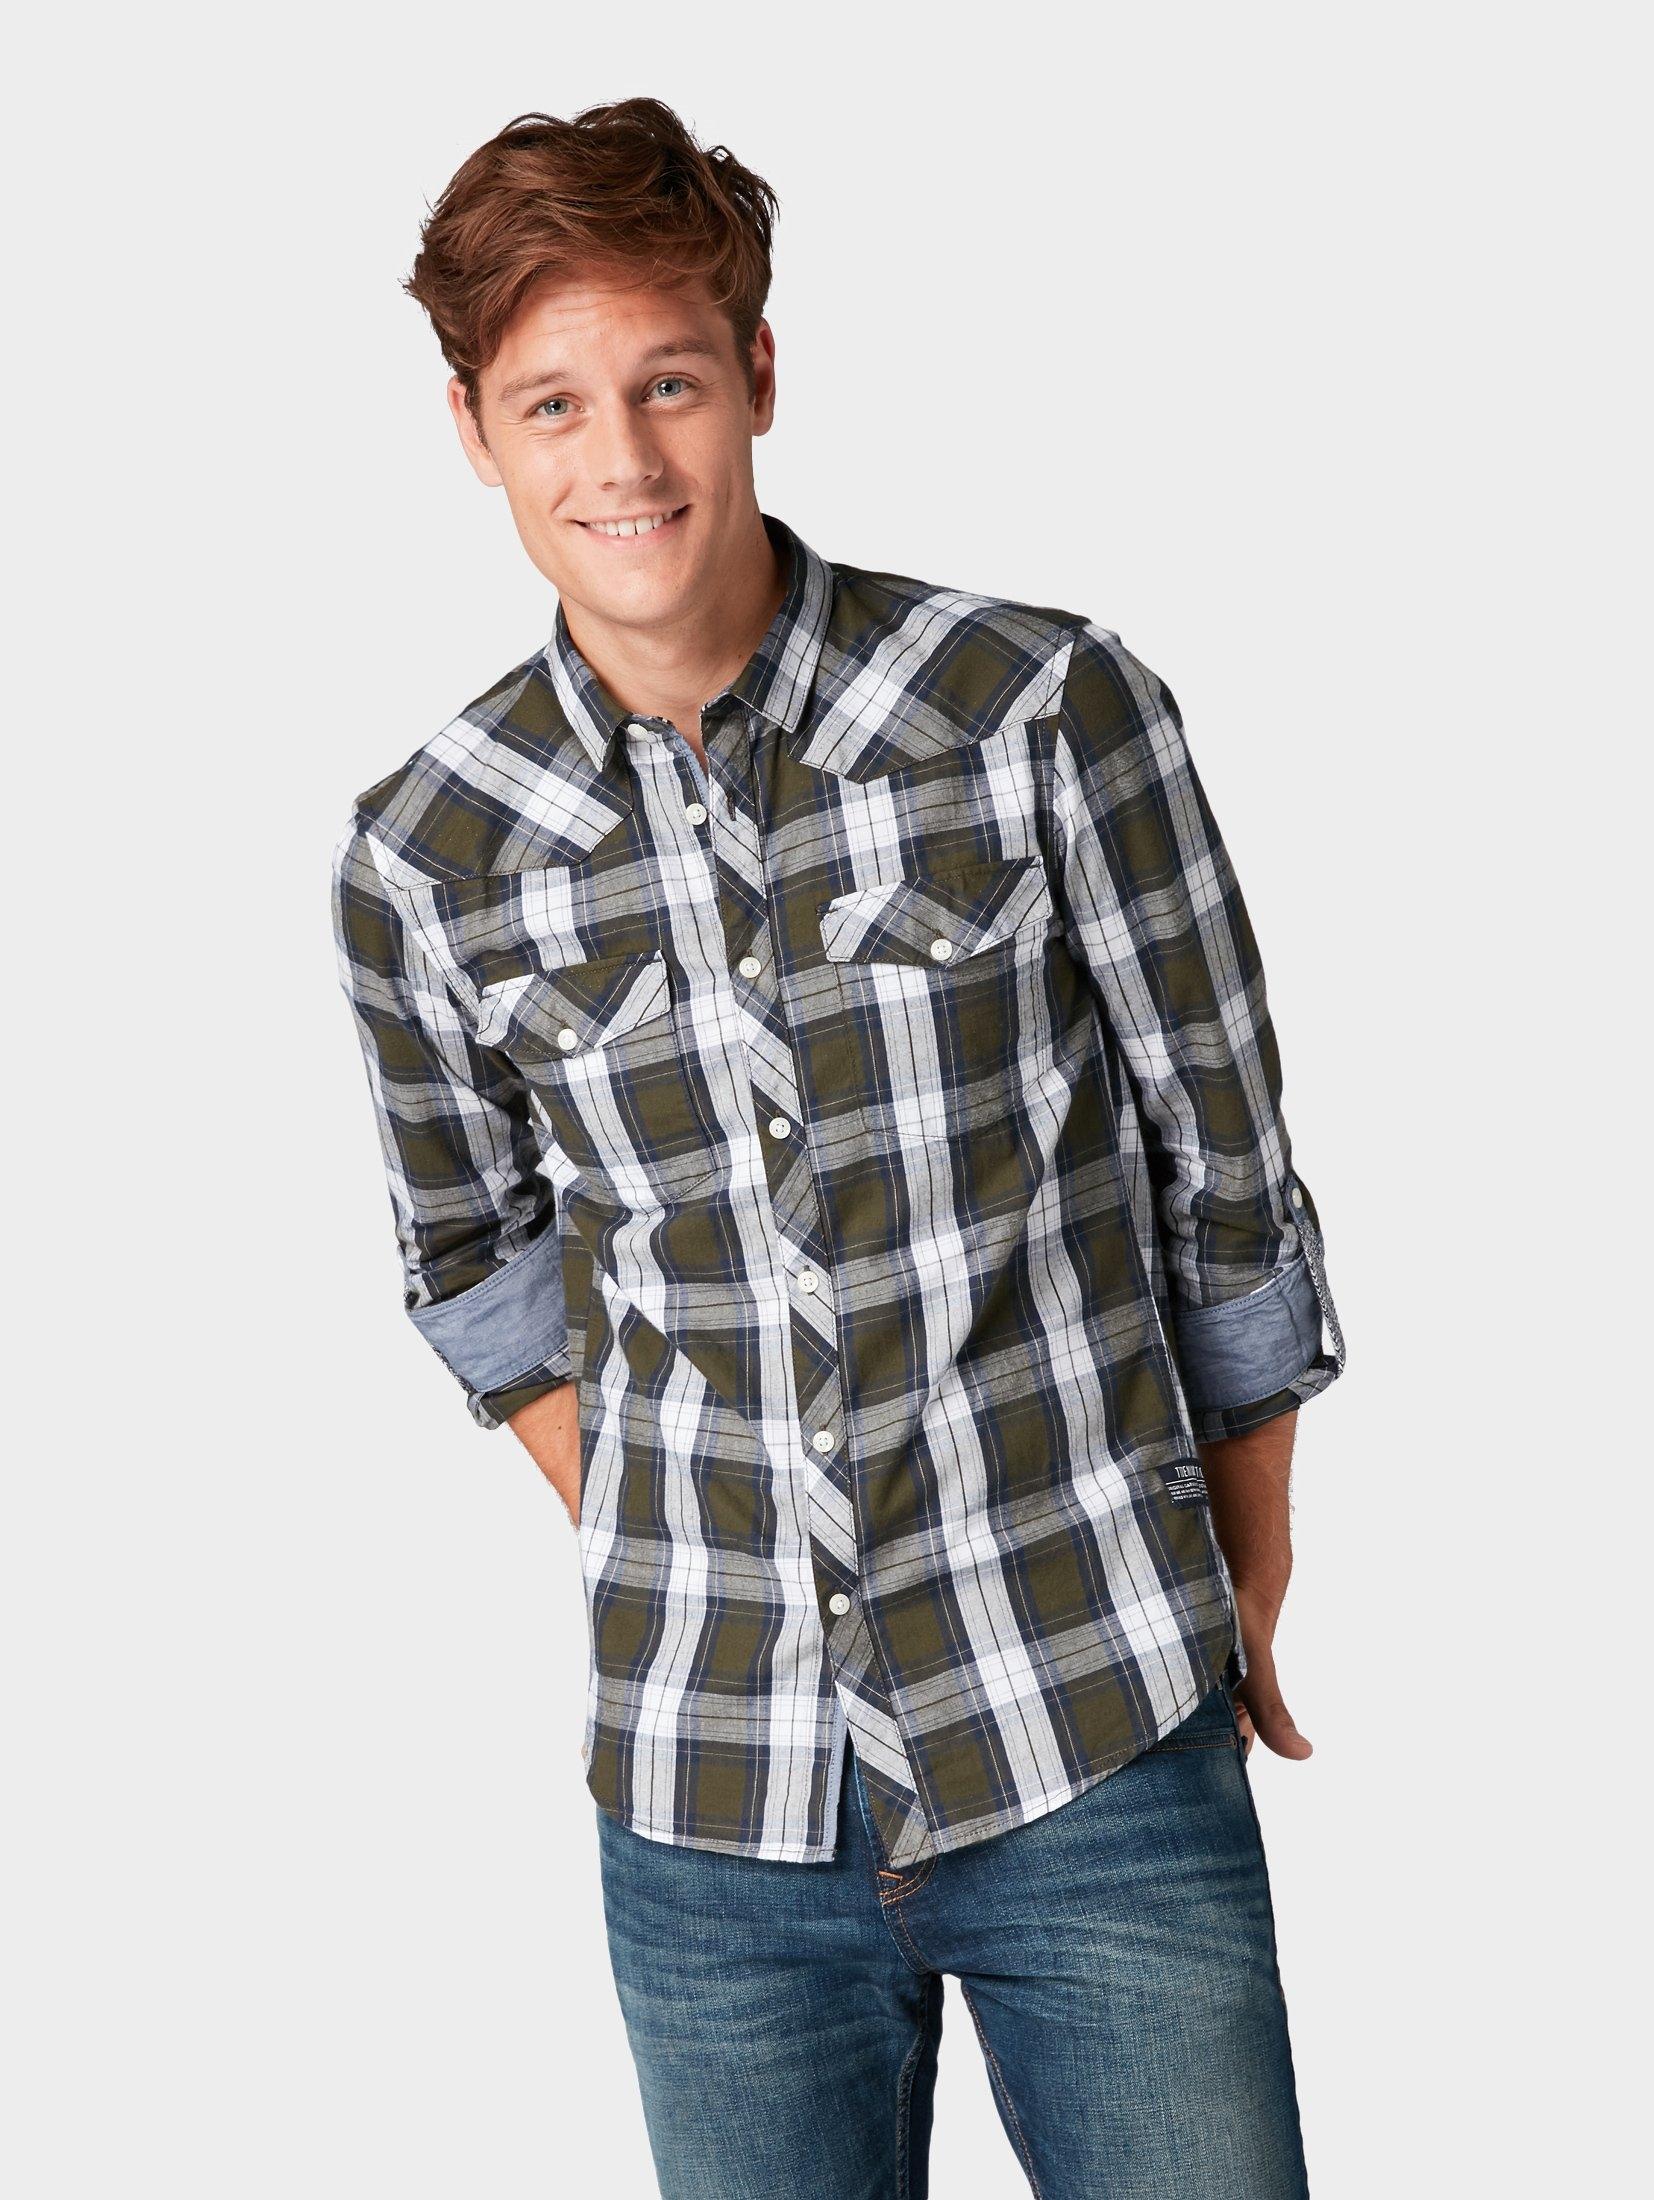 Groen Geruit Overhemd.Tom Tailor Denim Overhemd Geruit Overhemd Vind Je Bij Otto